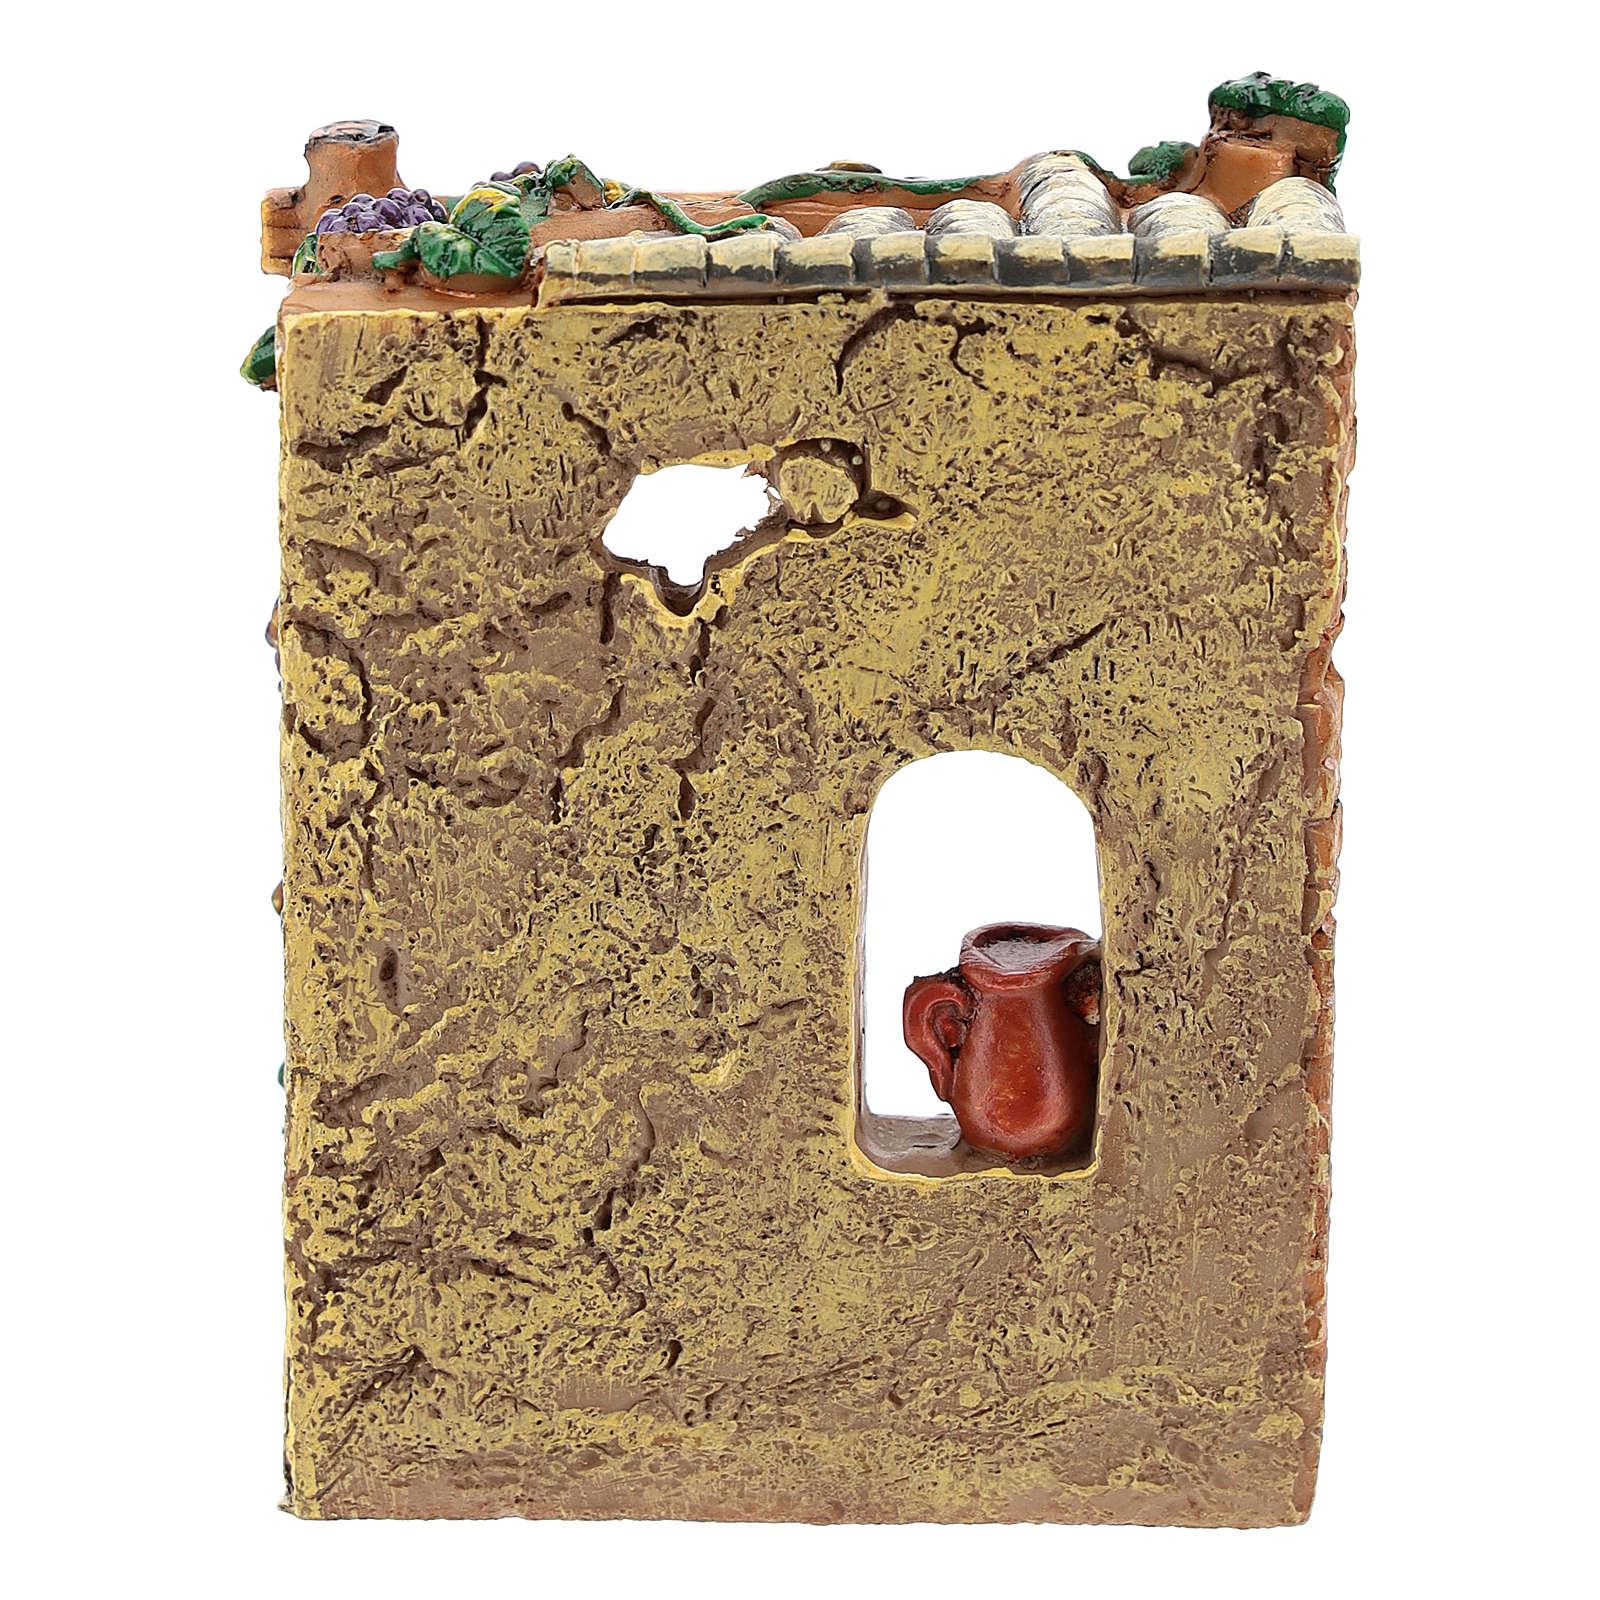 Tienda taberna de resina 10x7x4 cm para belén 6-8 cm 4